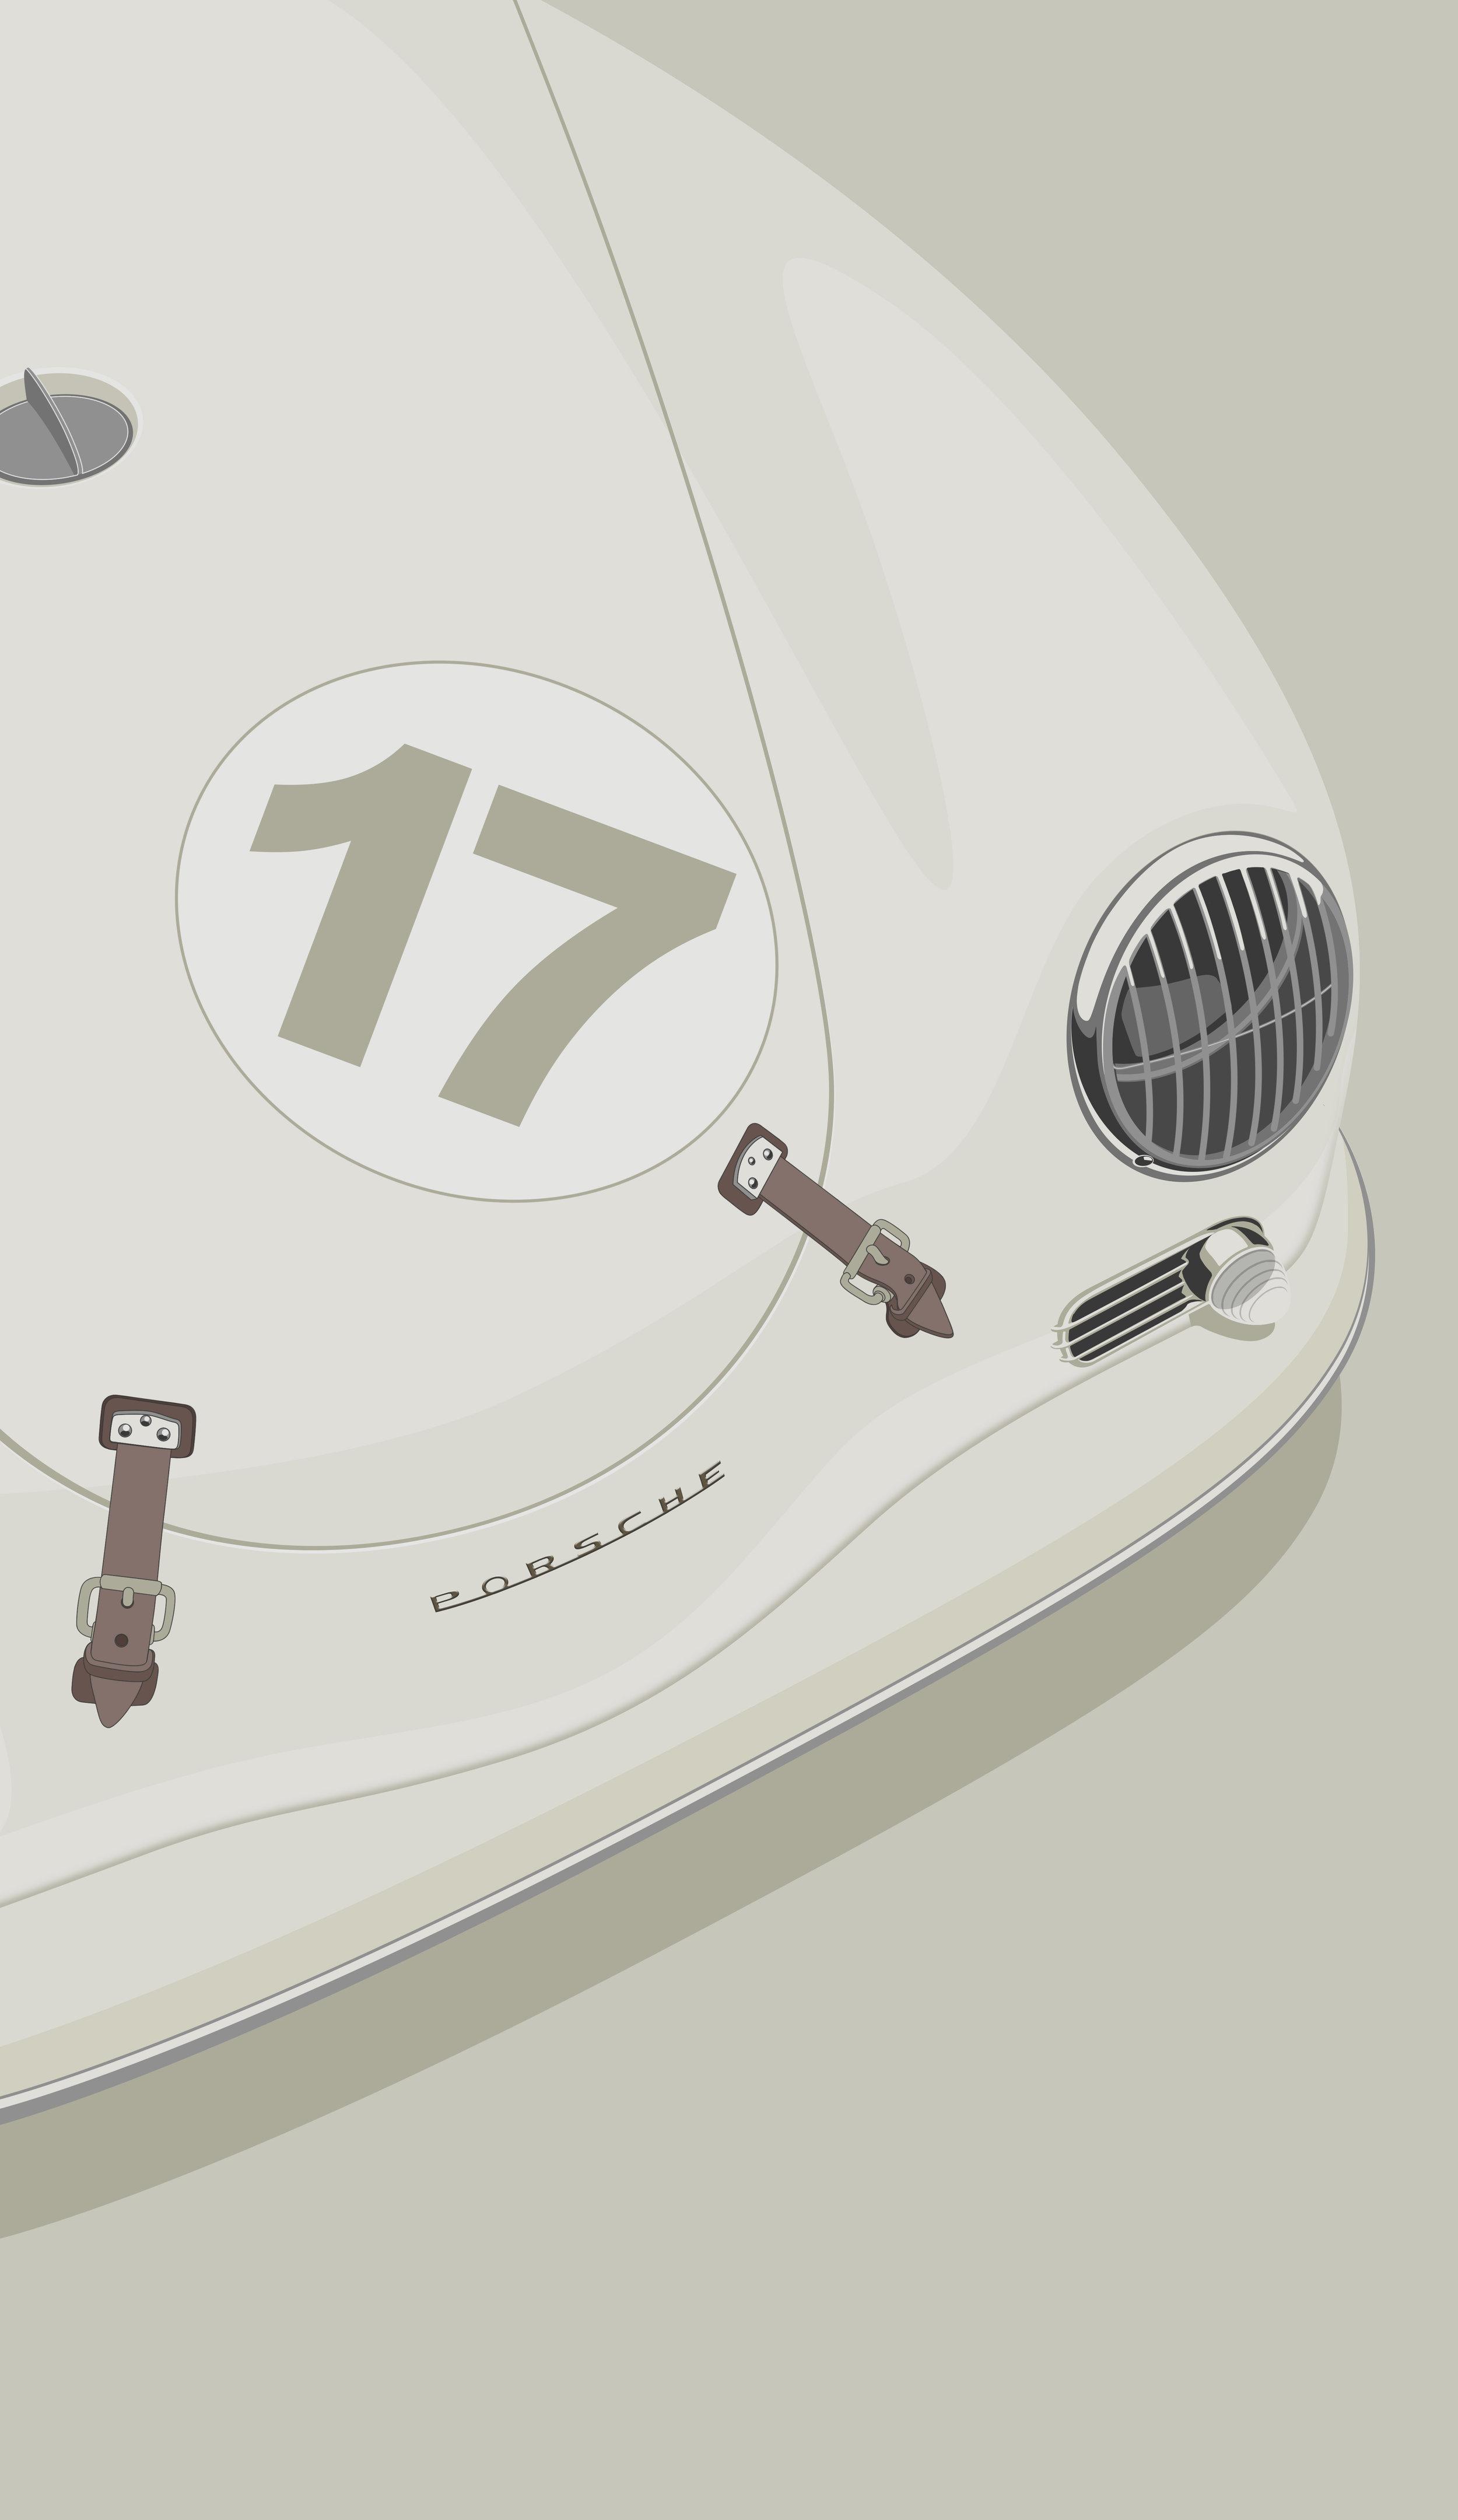 GY_Porsche_Speedster.jpg